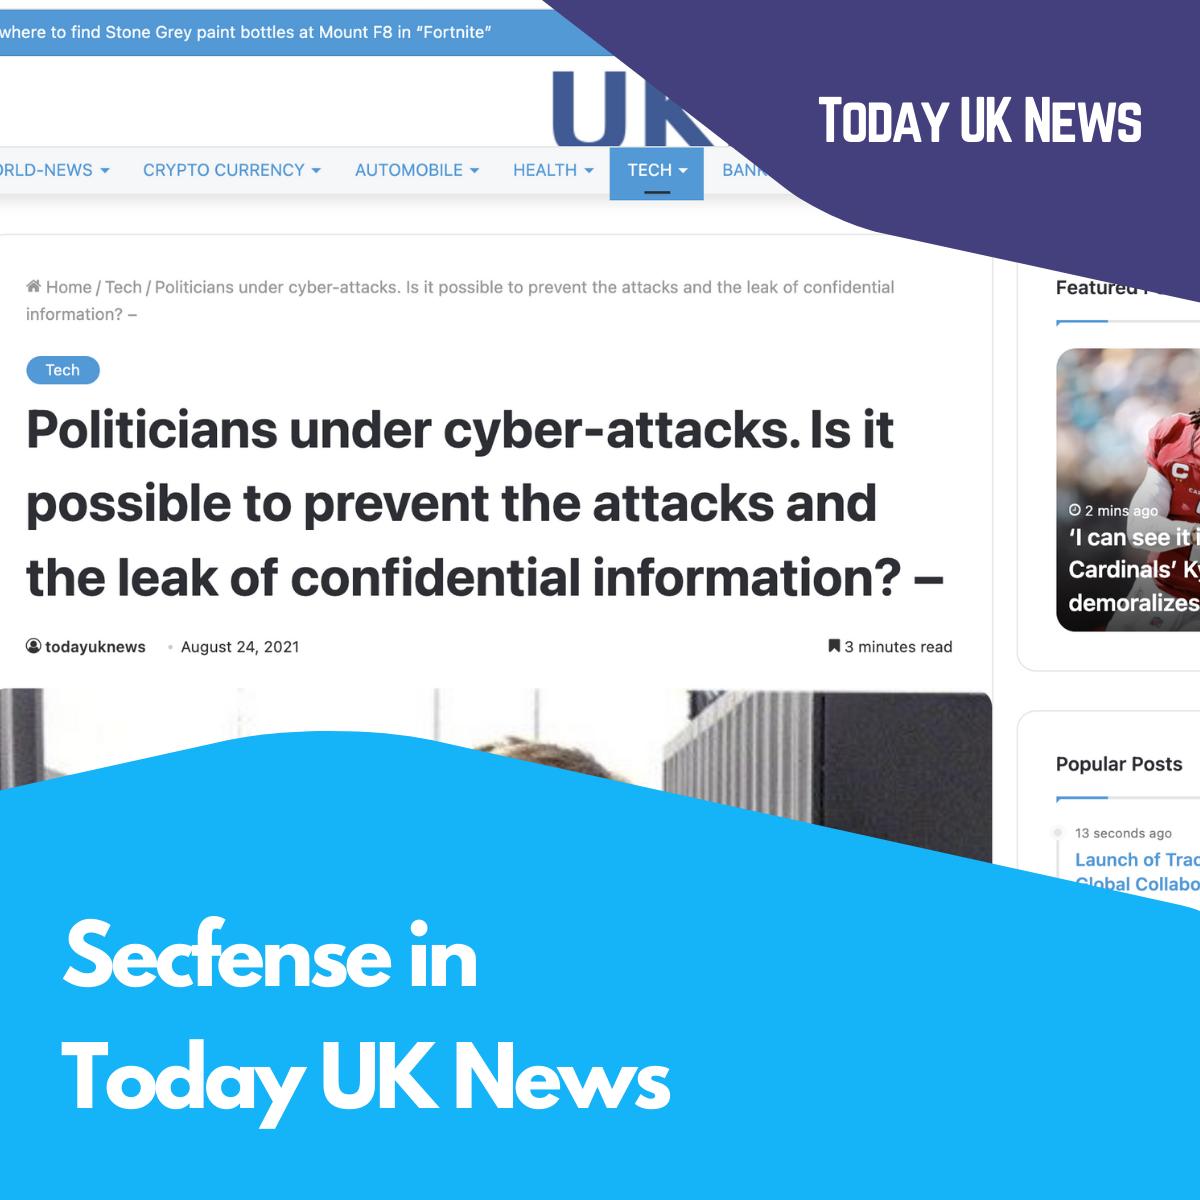 Secfense in Today UK News